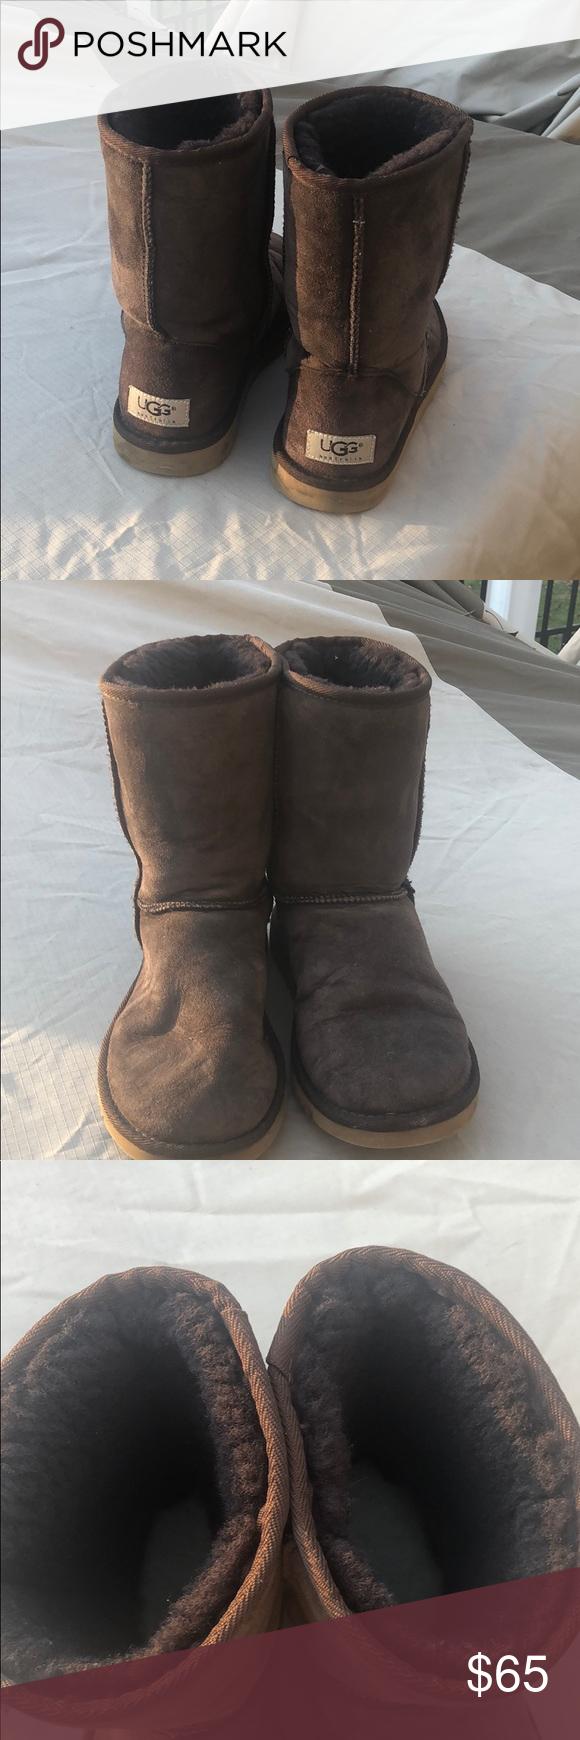 SALE! EUC Chocolate Classic Ugg boots